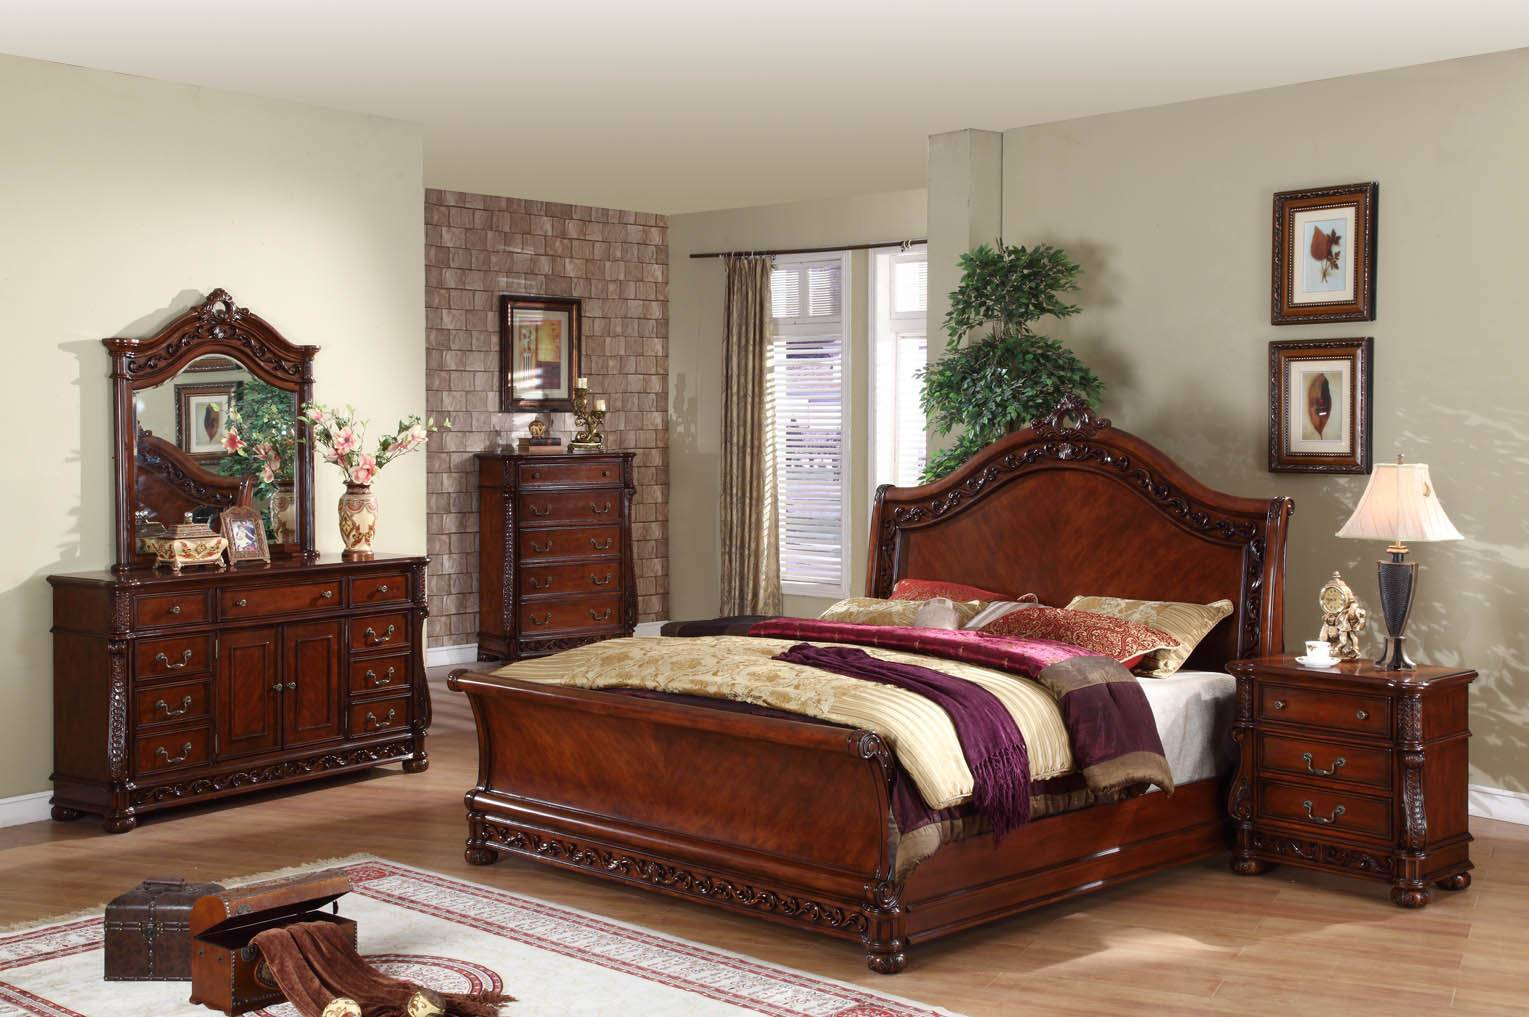 Antique Wood Furniture  Wooden Furniture  Wooden Office